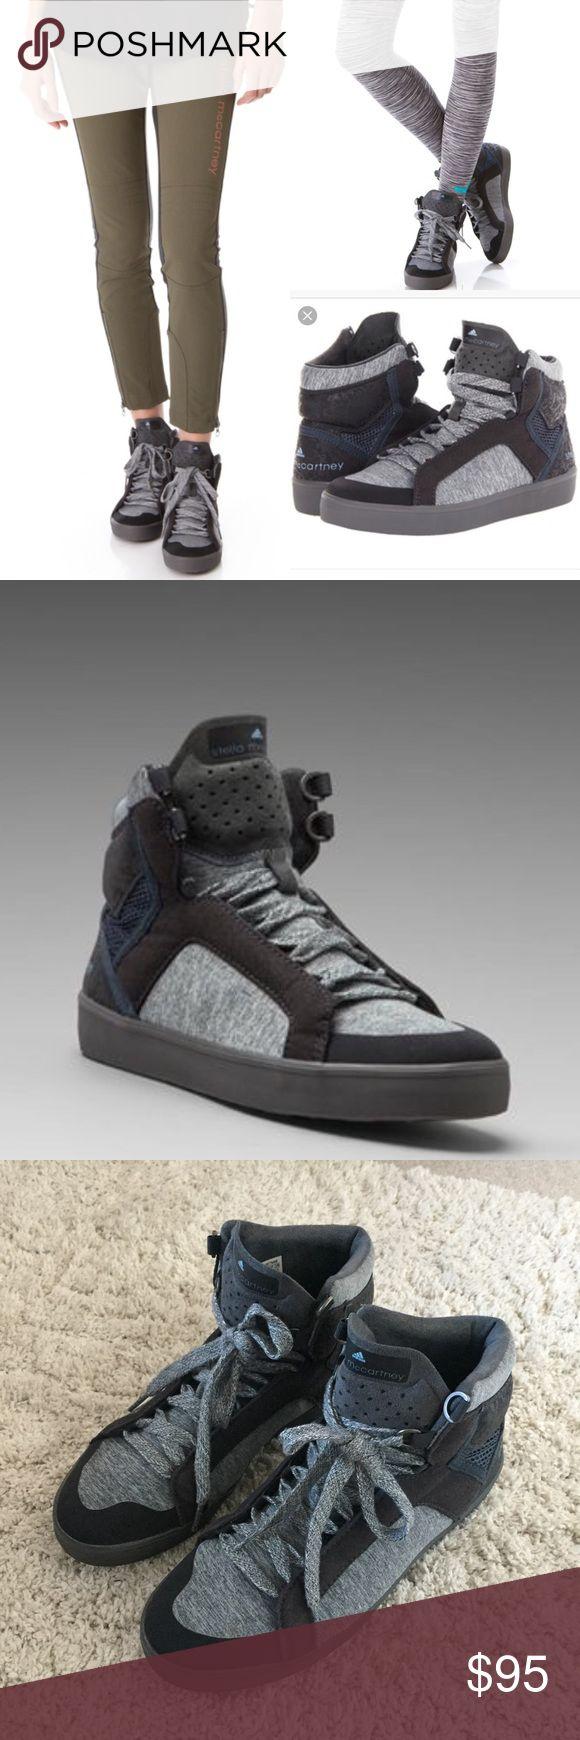 Adidas by Stella McCartney Discosura Hiker Boot Adidas by Stella McCartney Discosura High Tops. Hardly worn! Adidas by Stella McCartney Shoes Sneakers